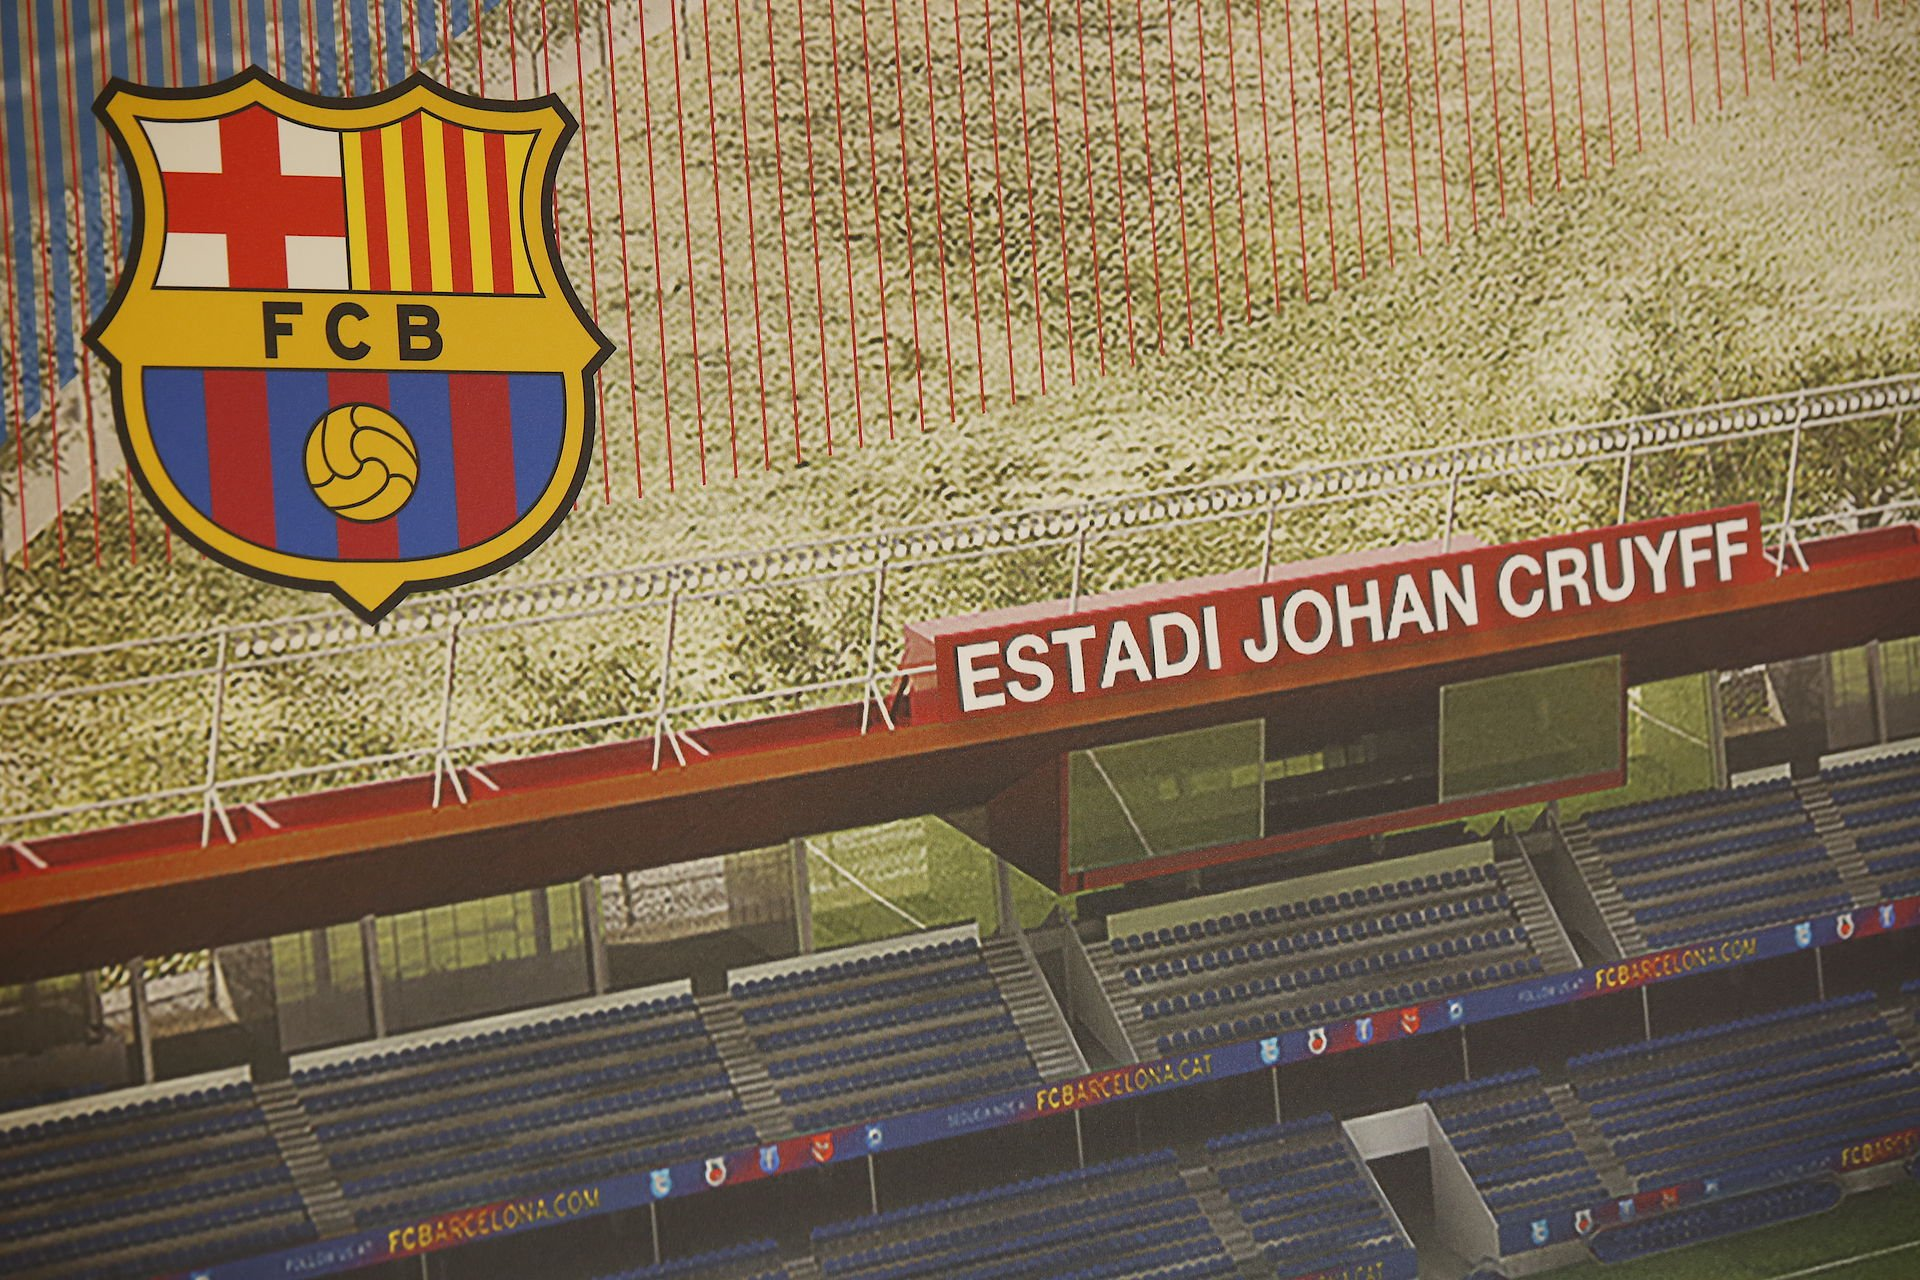 Escut Barça fcb estadi Johan Cruyff - Sergi Alcàzar